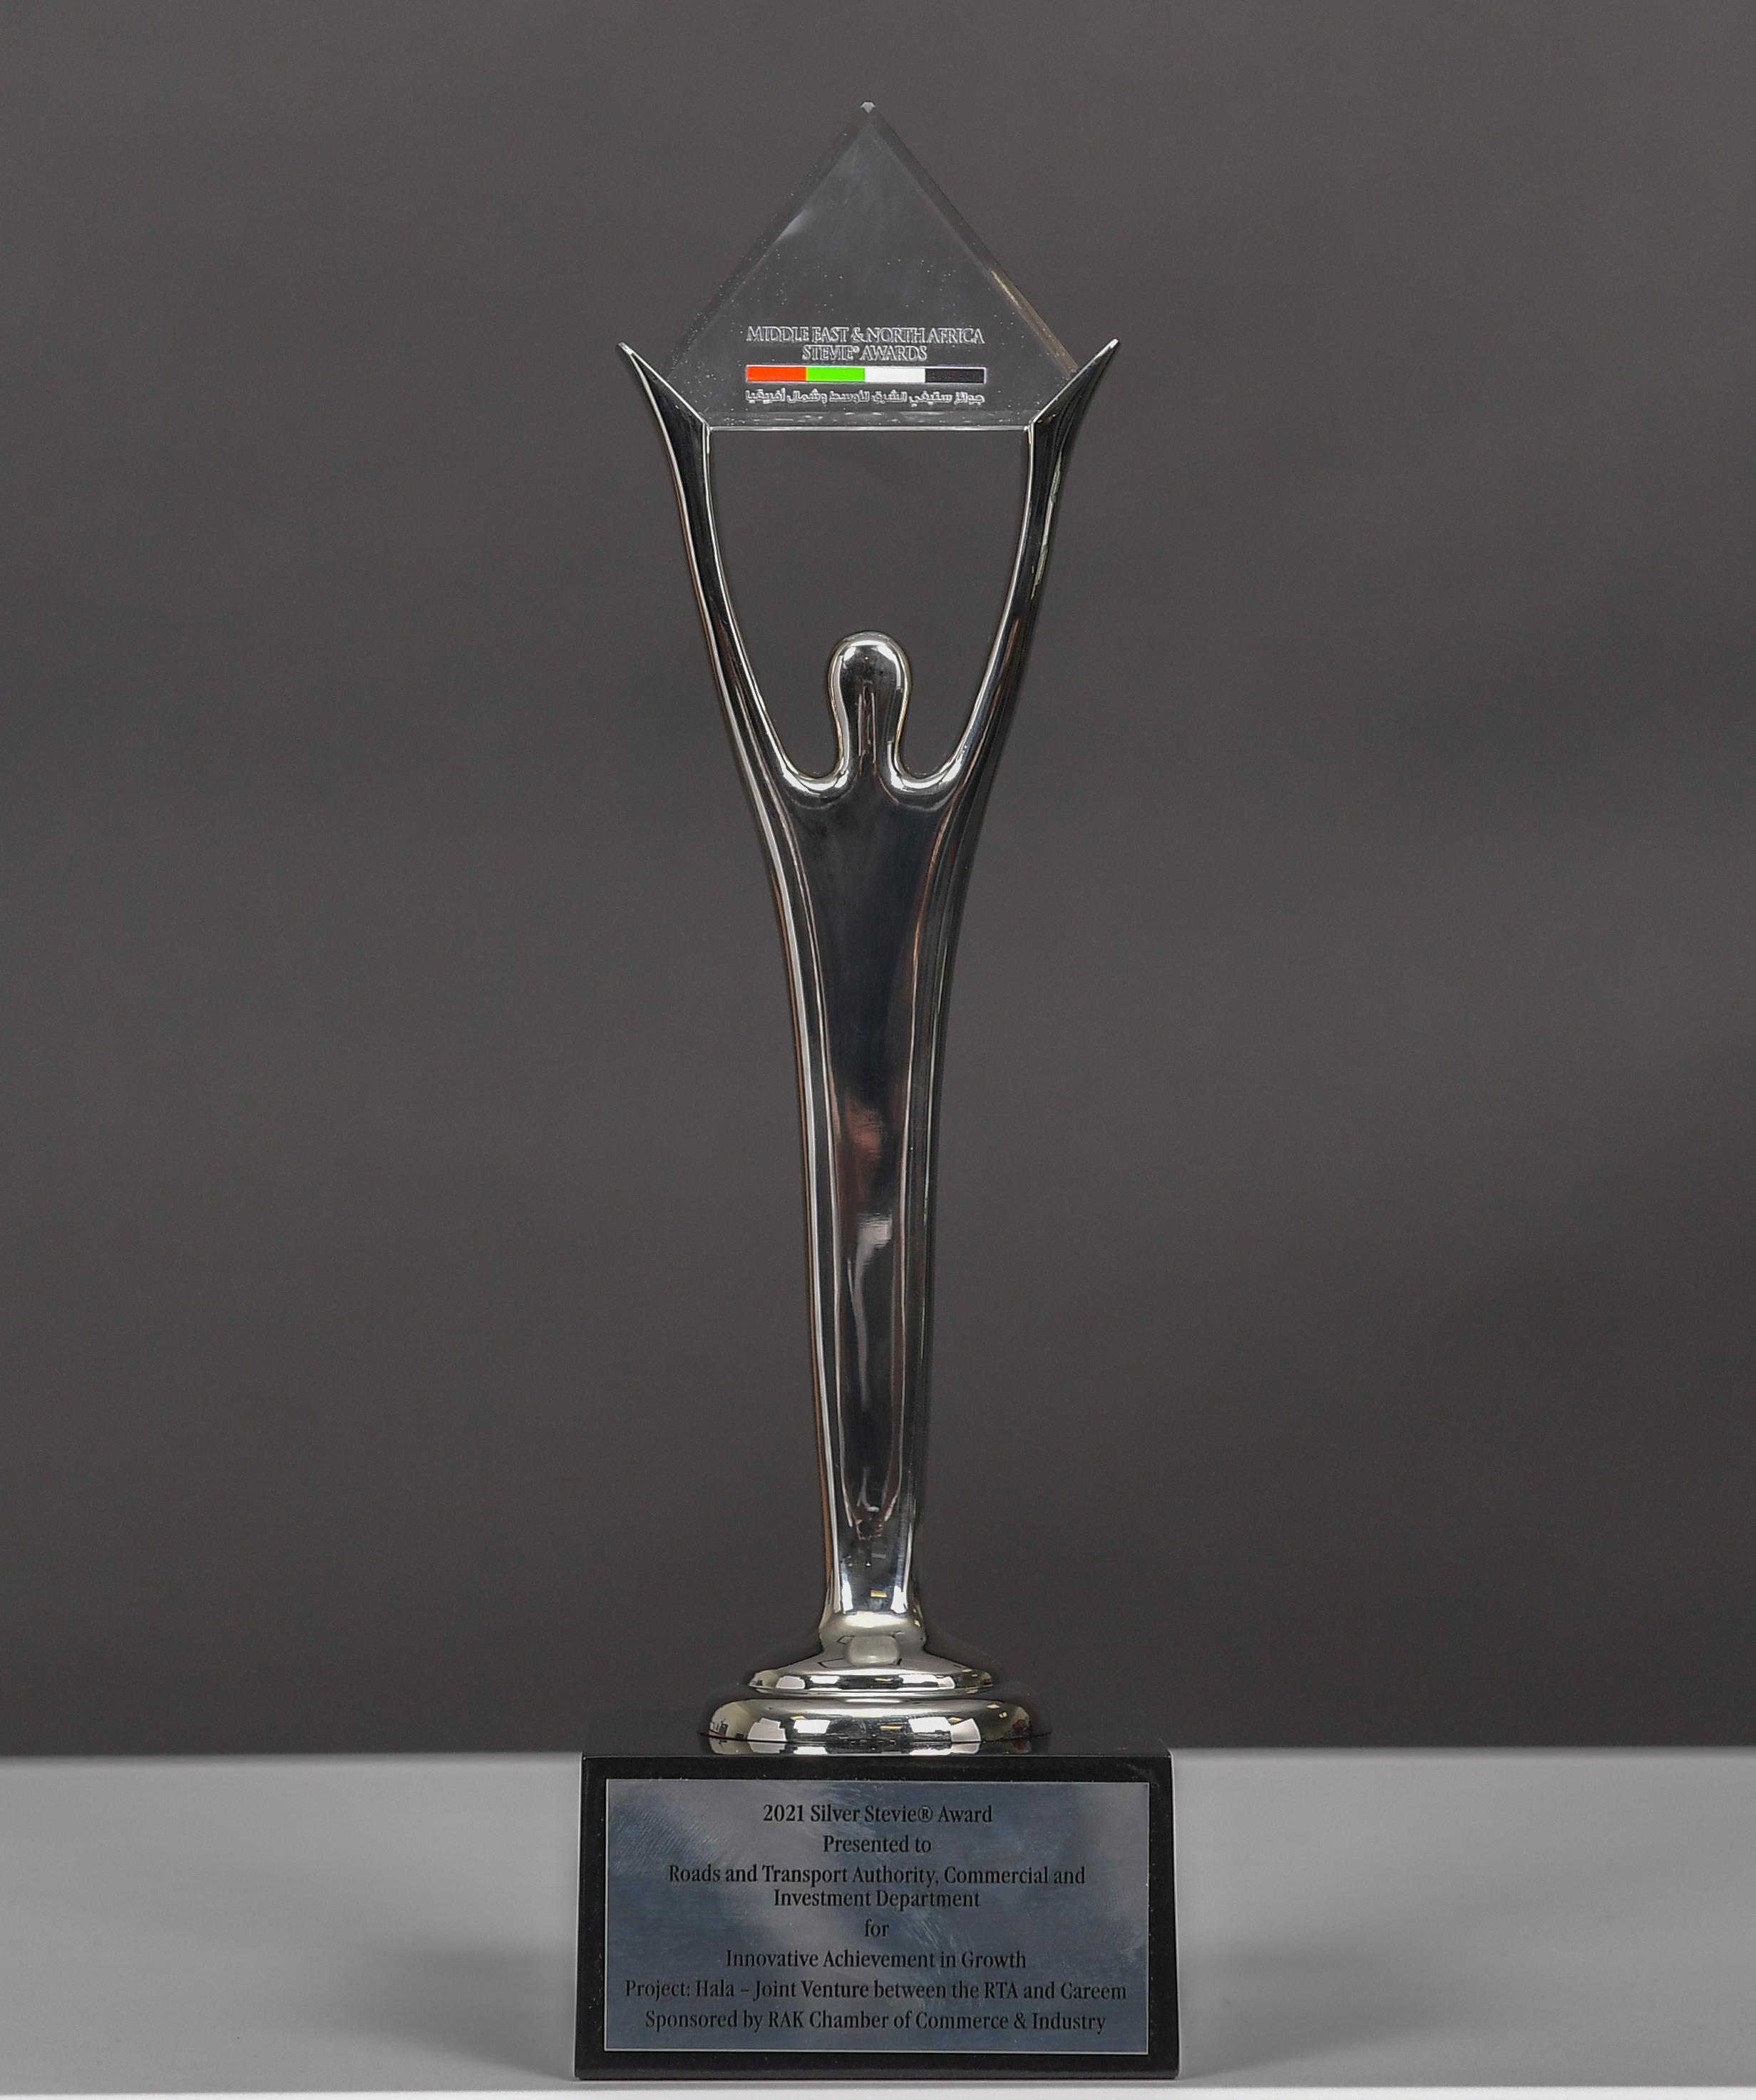 , Dubai's Roads and Transport Authority wins Stevie International Award for innovative PPP Venture